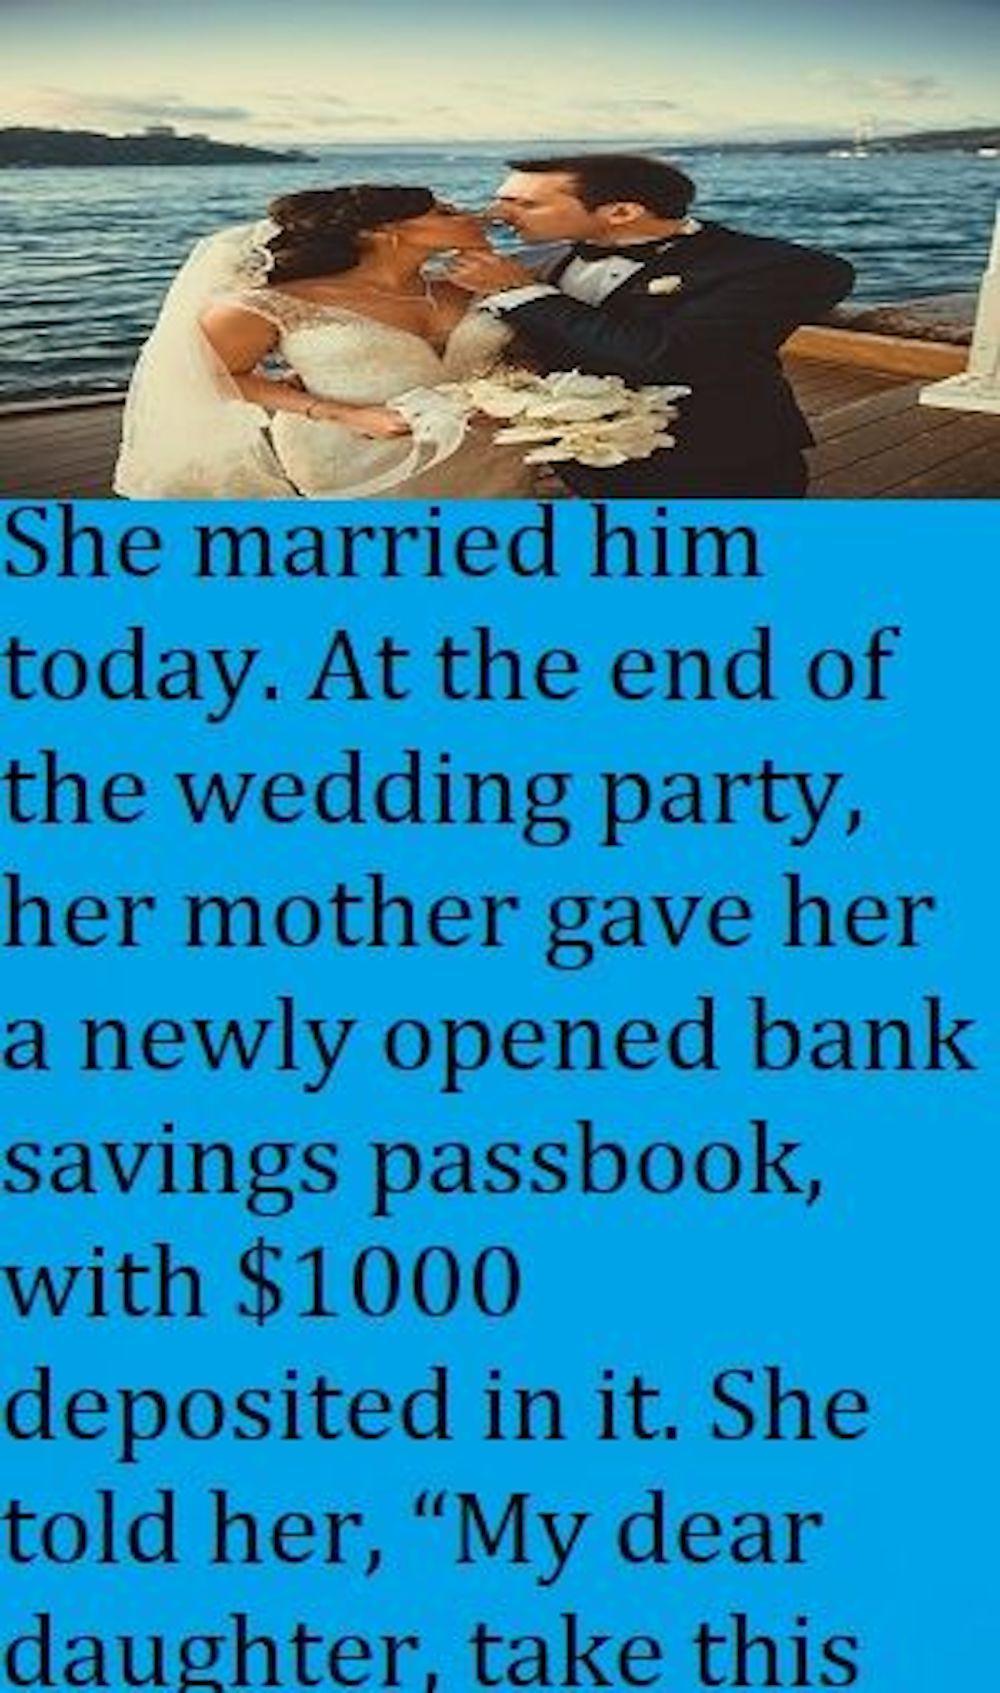 The Wedding Passbook